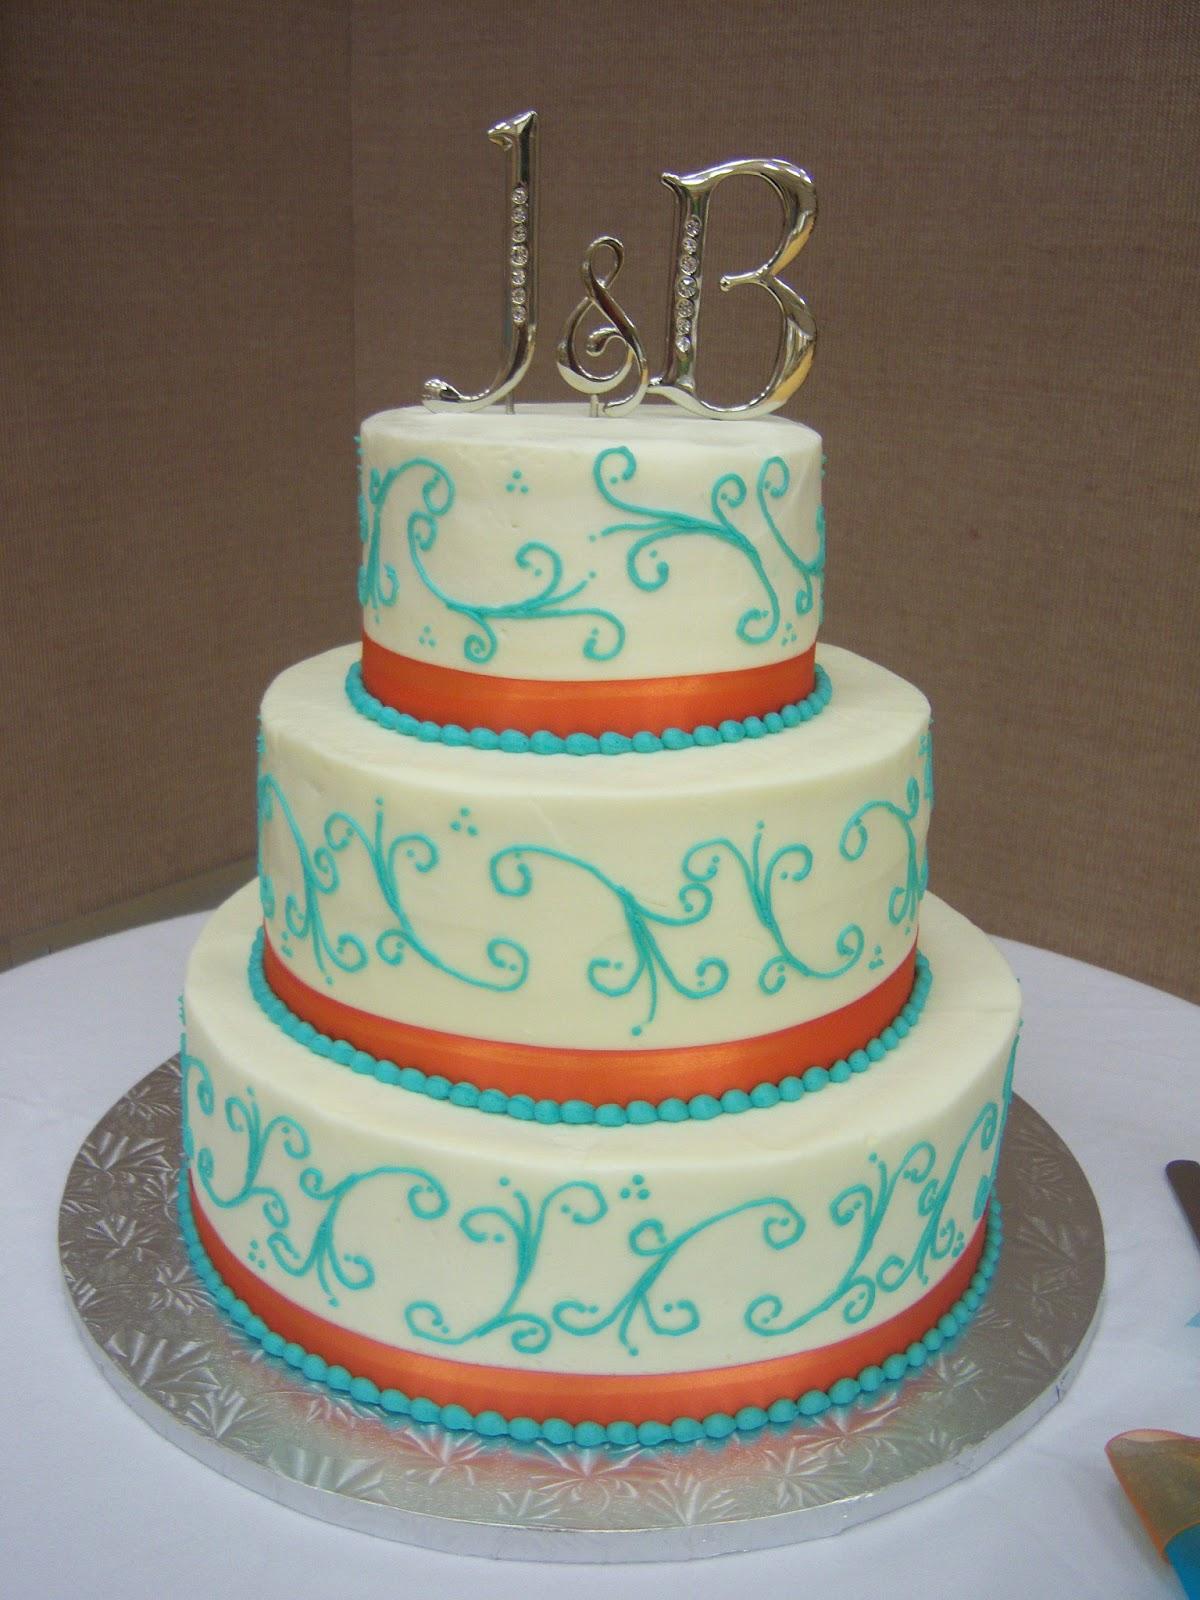 creative cakes by angela turquoise and orange wedding cake. Black Bedroom Furniture Sets. Home Design Ideas